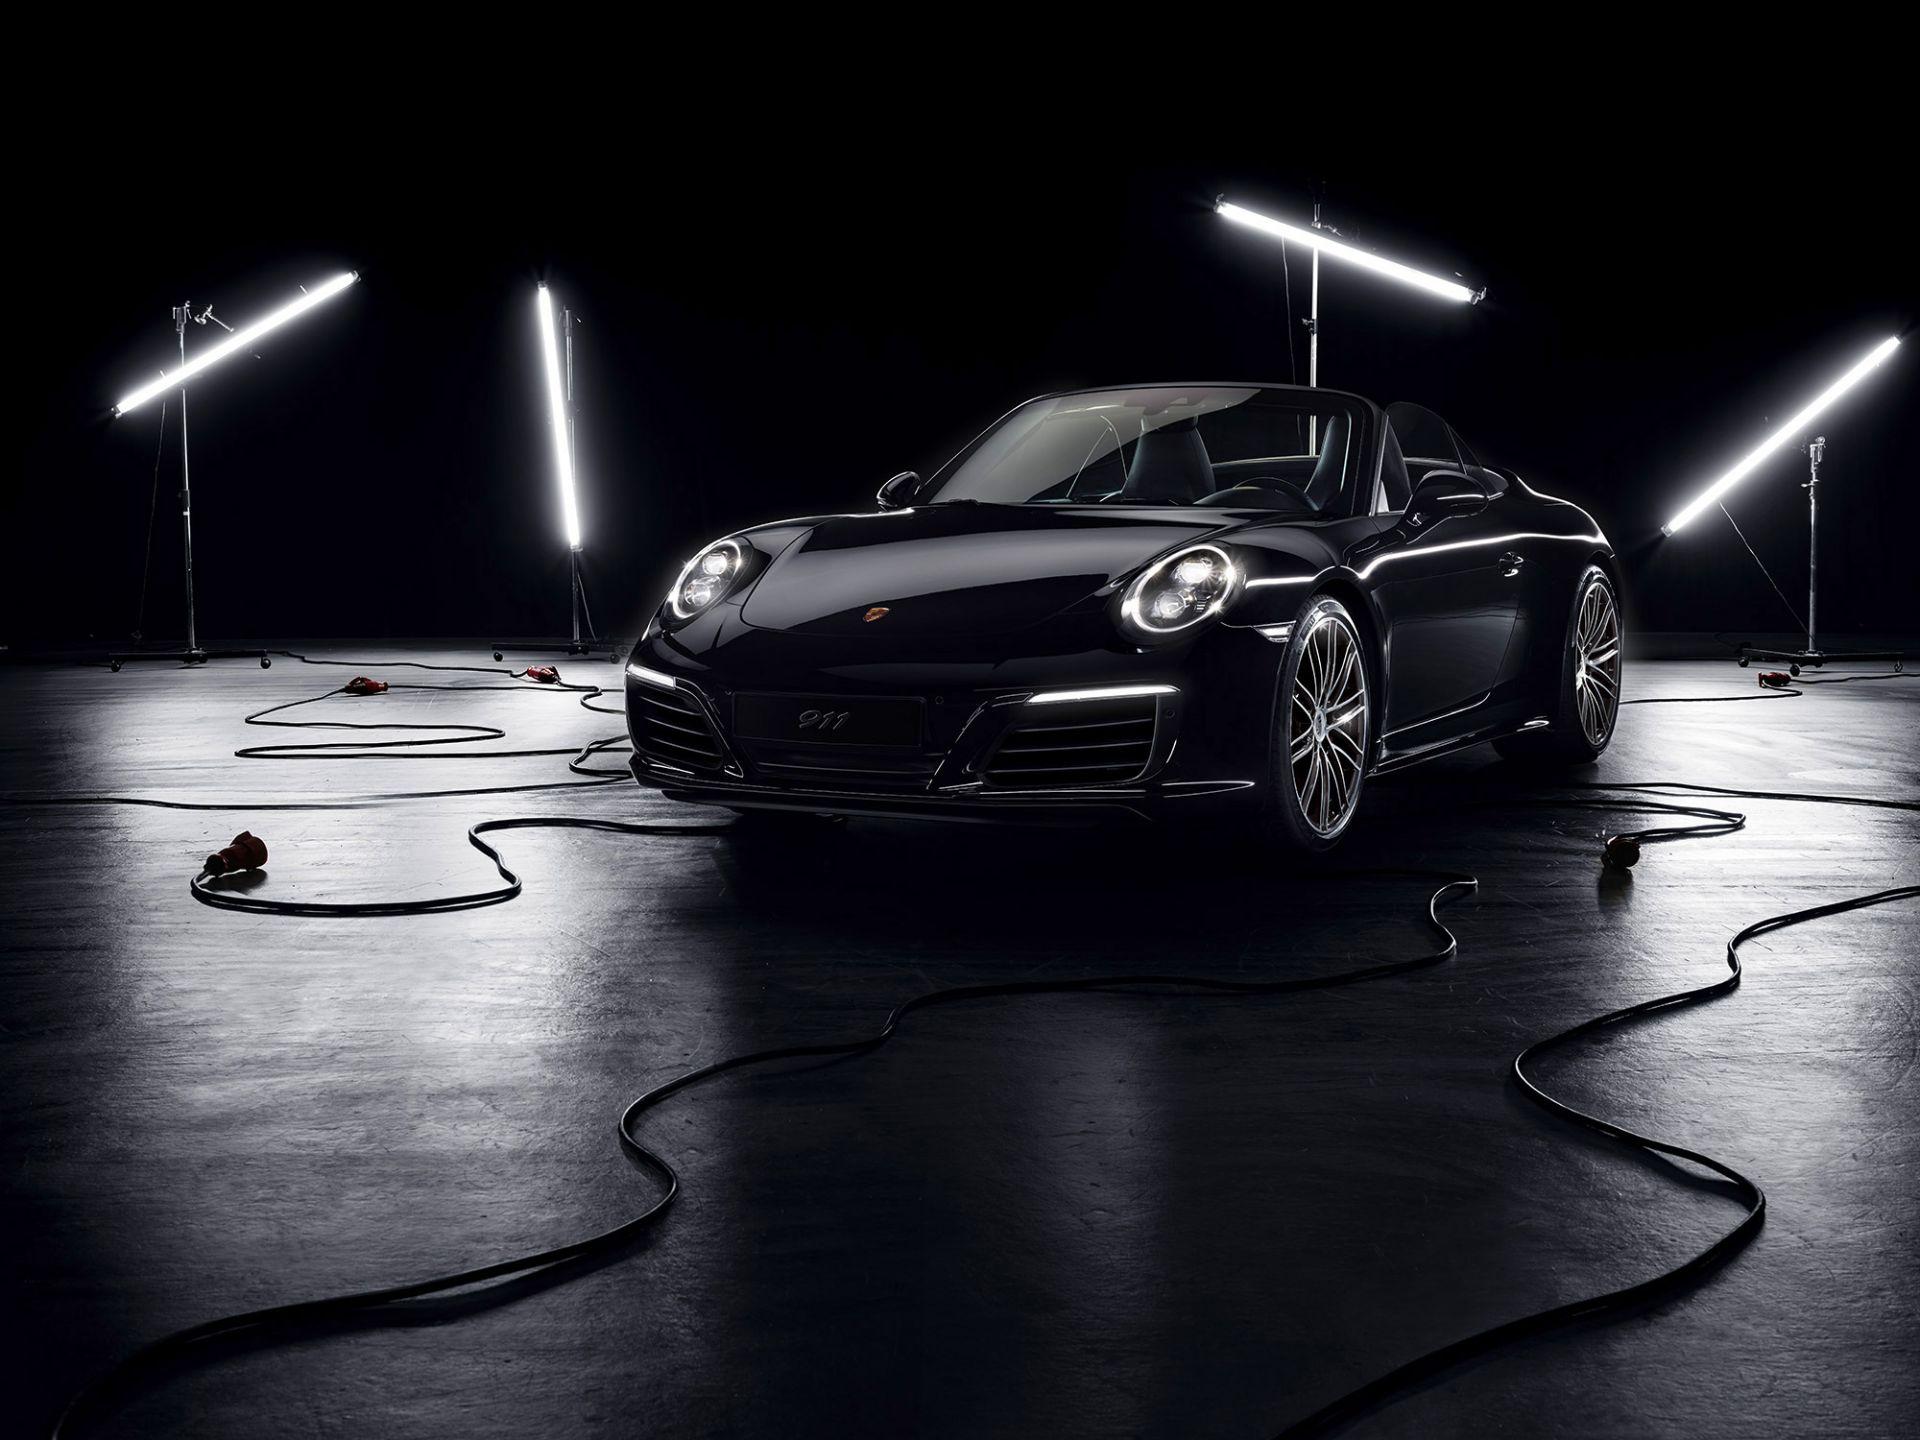 Los 6 - 911 (991) Carrera 4S Cabriolet Listenpreis: 170.556,55 € Hubraum: 2.981 ccm Leistung: 309 kW / 420